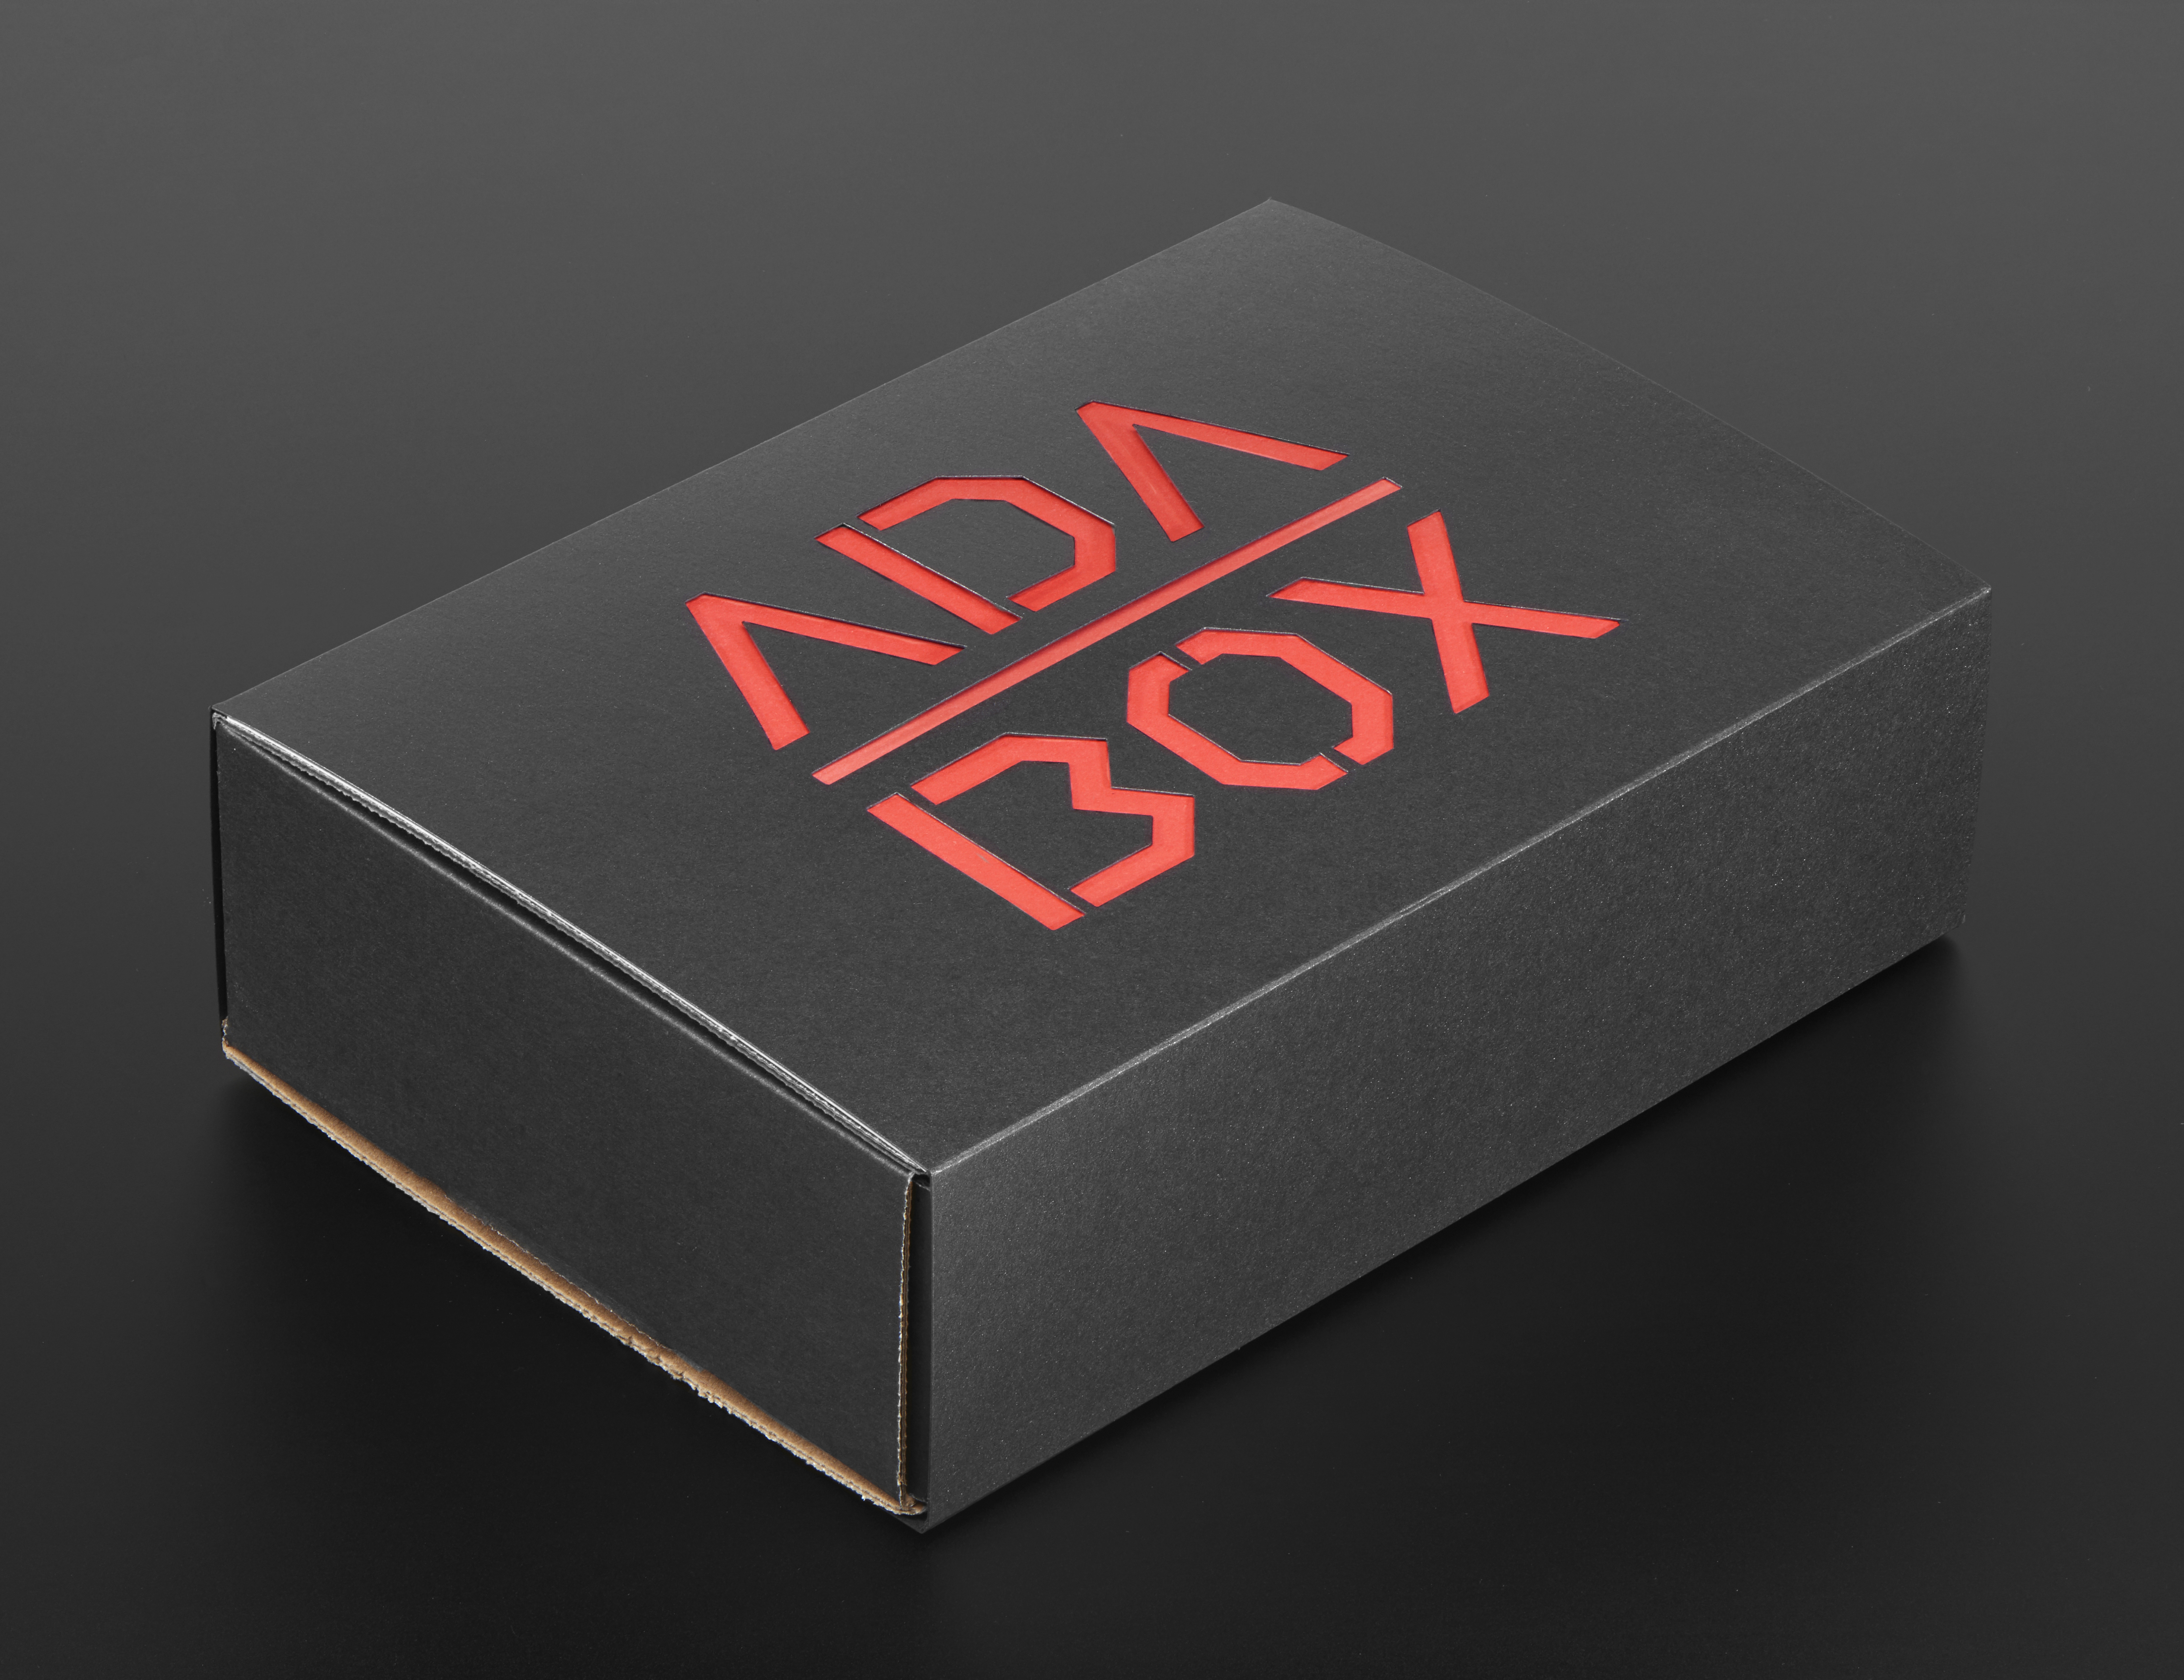 adafruit_io_Adabox_03_iso_box_ORIG.jpg